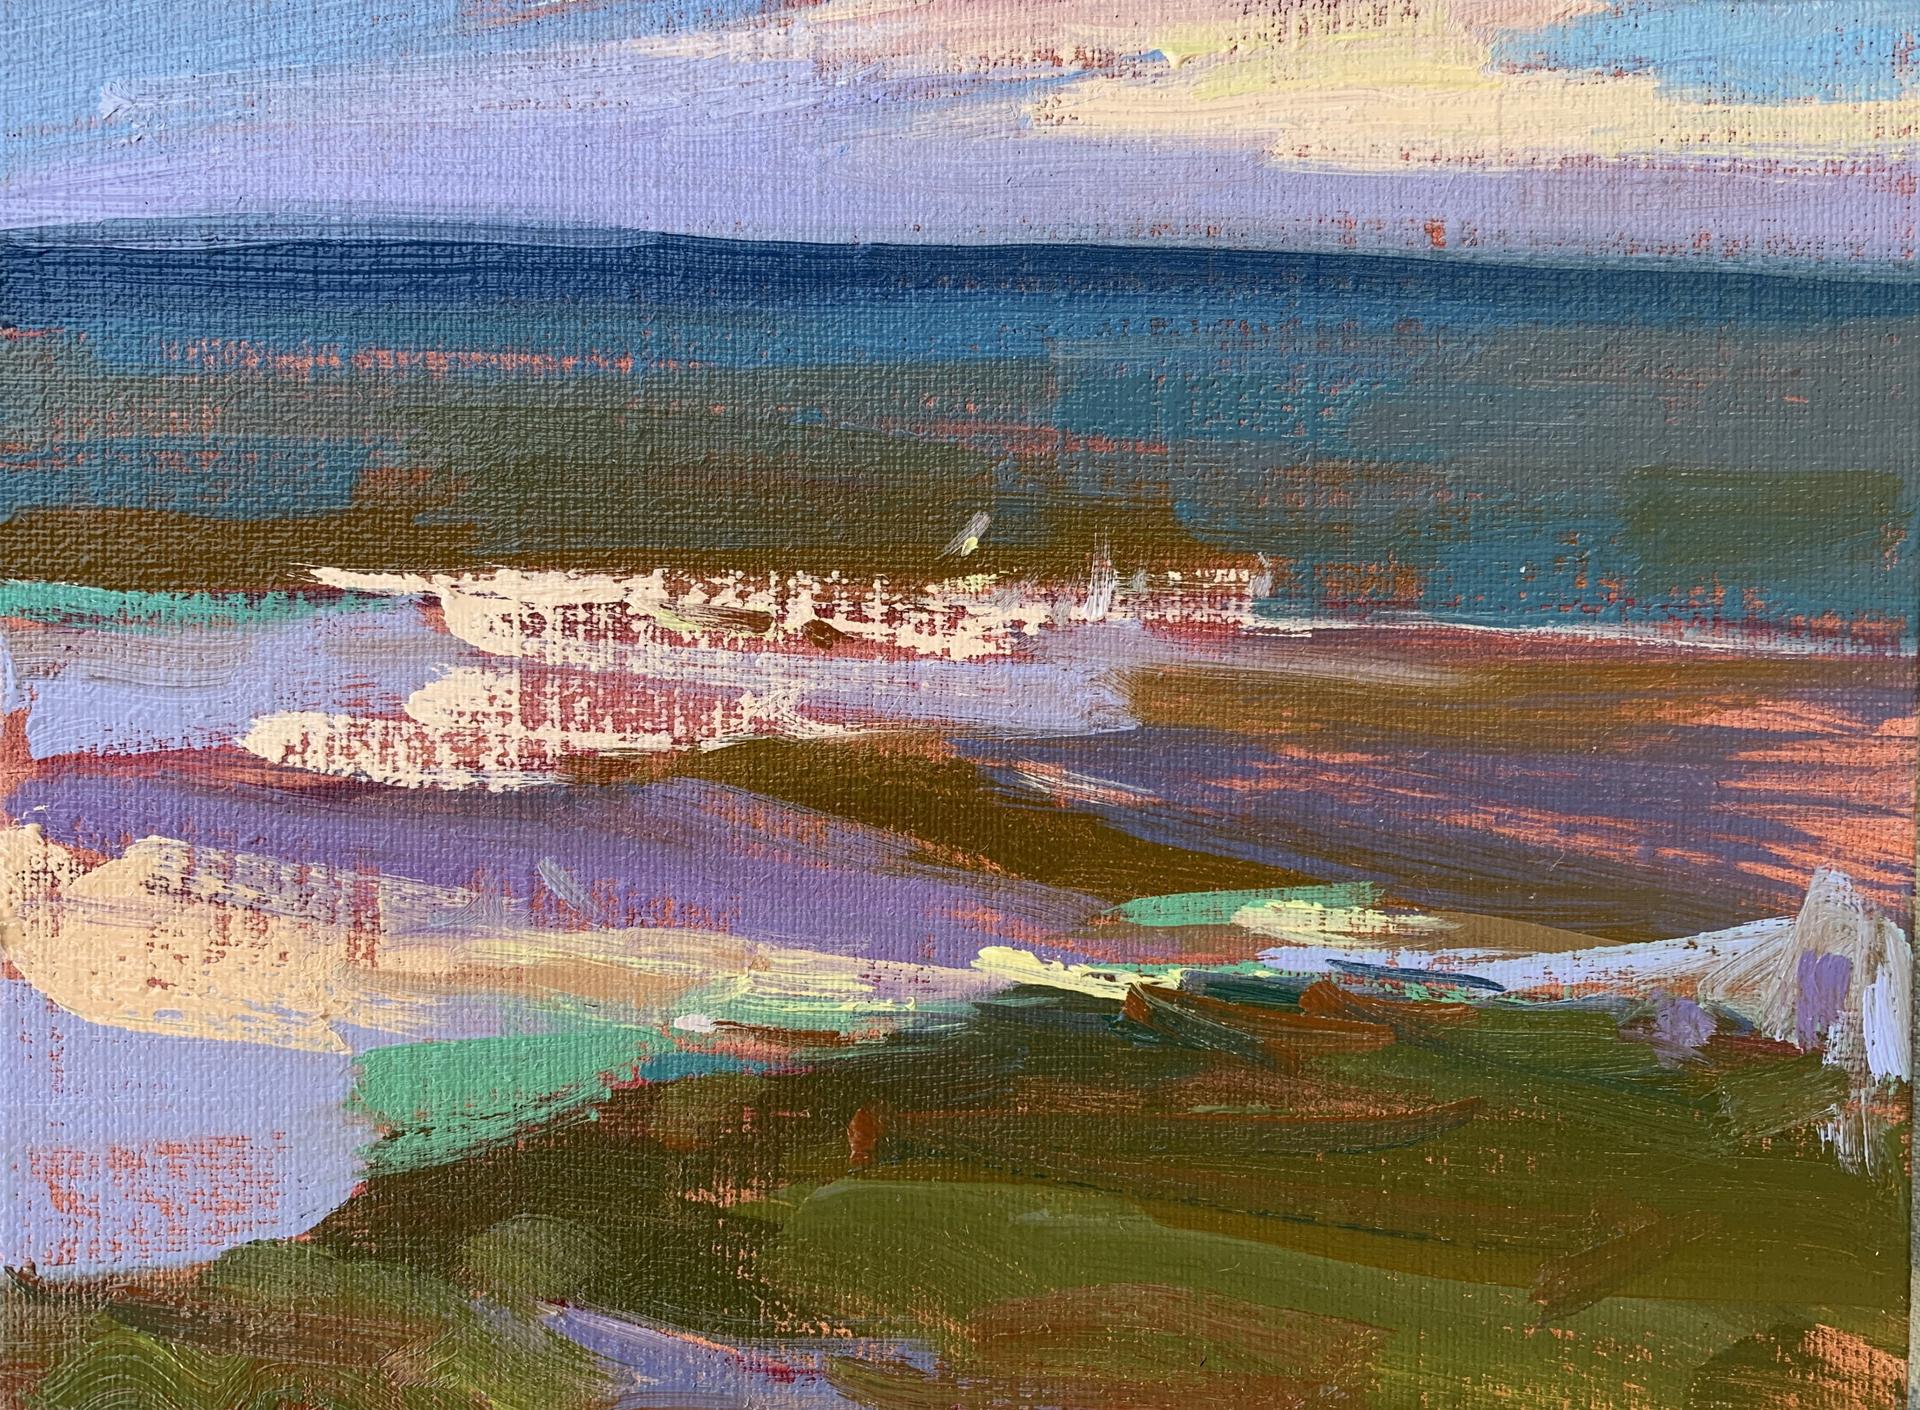 Cape San Blas II by Marissa Vogl